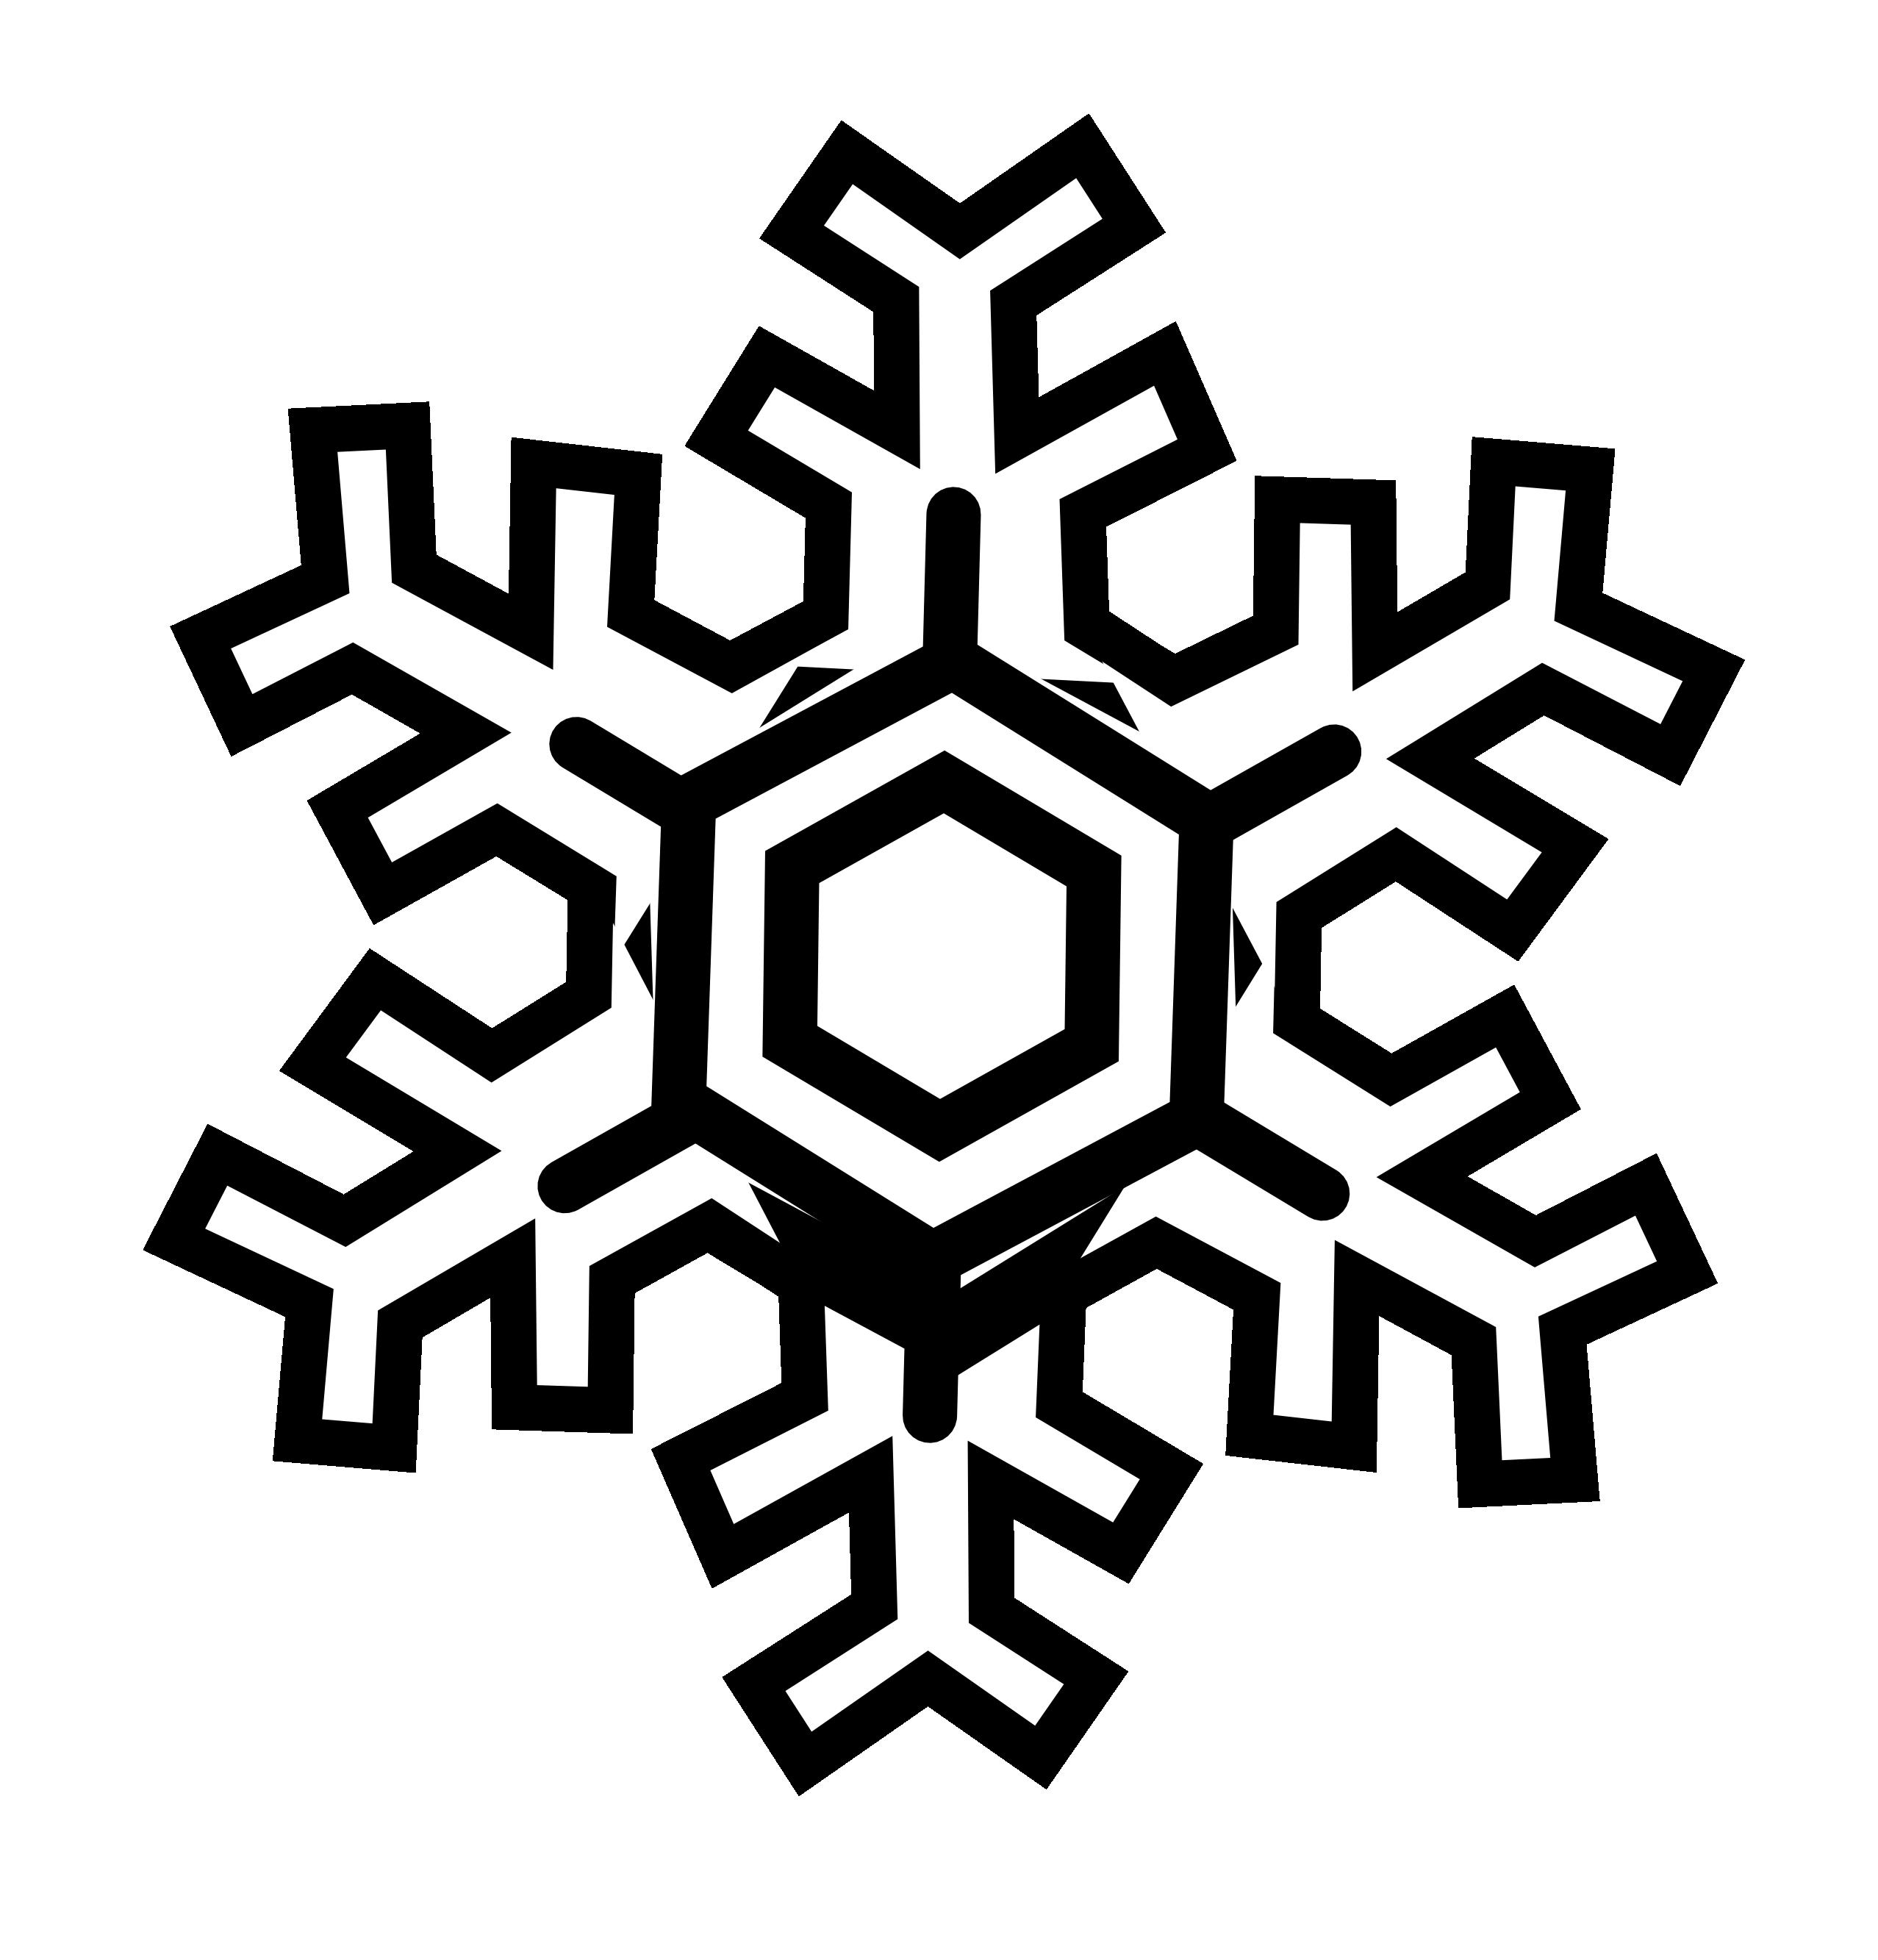 Winter clipart flake. Snowflake black and white